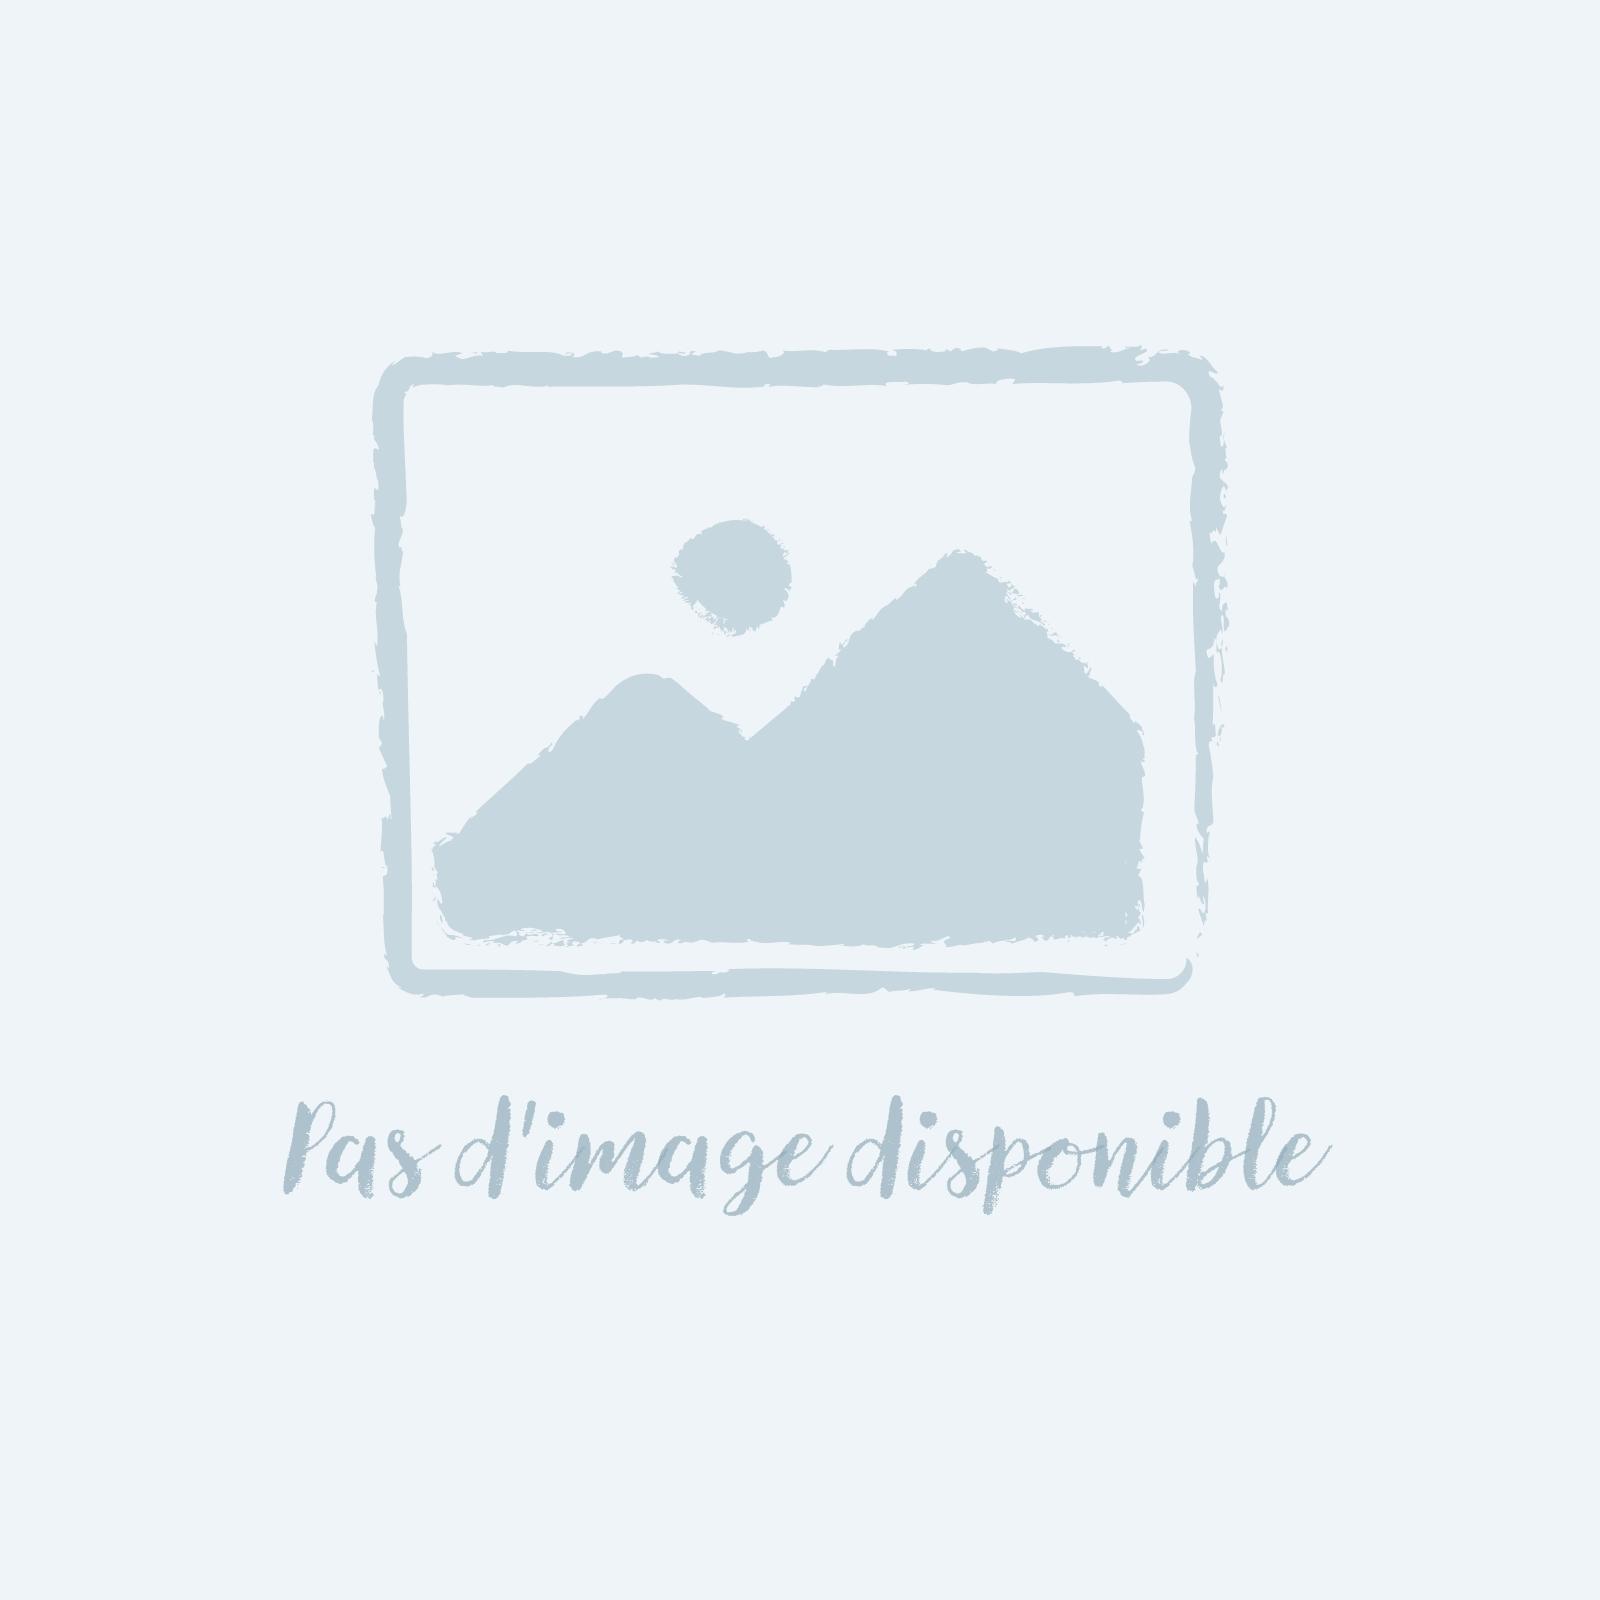 "Udirev Liberty Clic 30 ""6680 03 Béton clair"" - Dalle PVC sol clipsable"